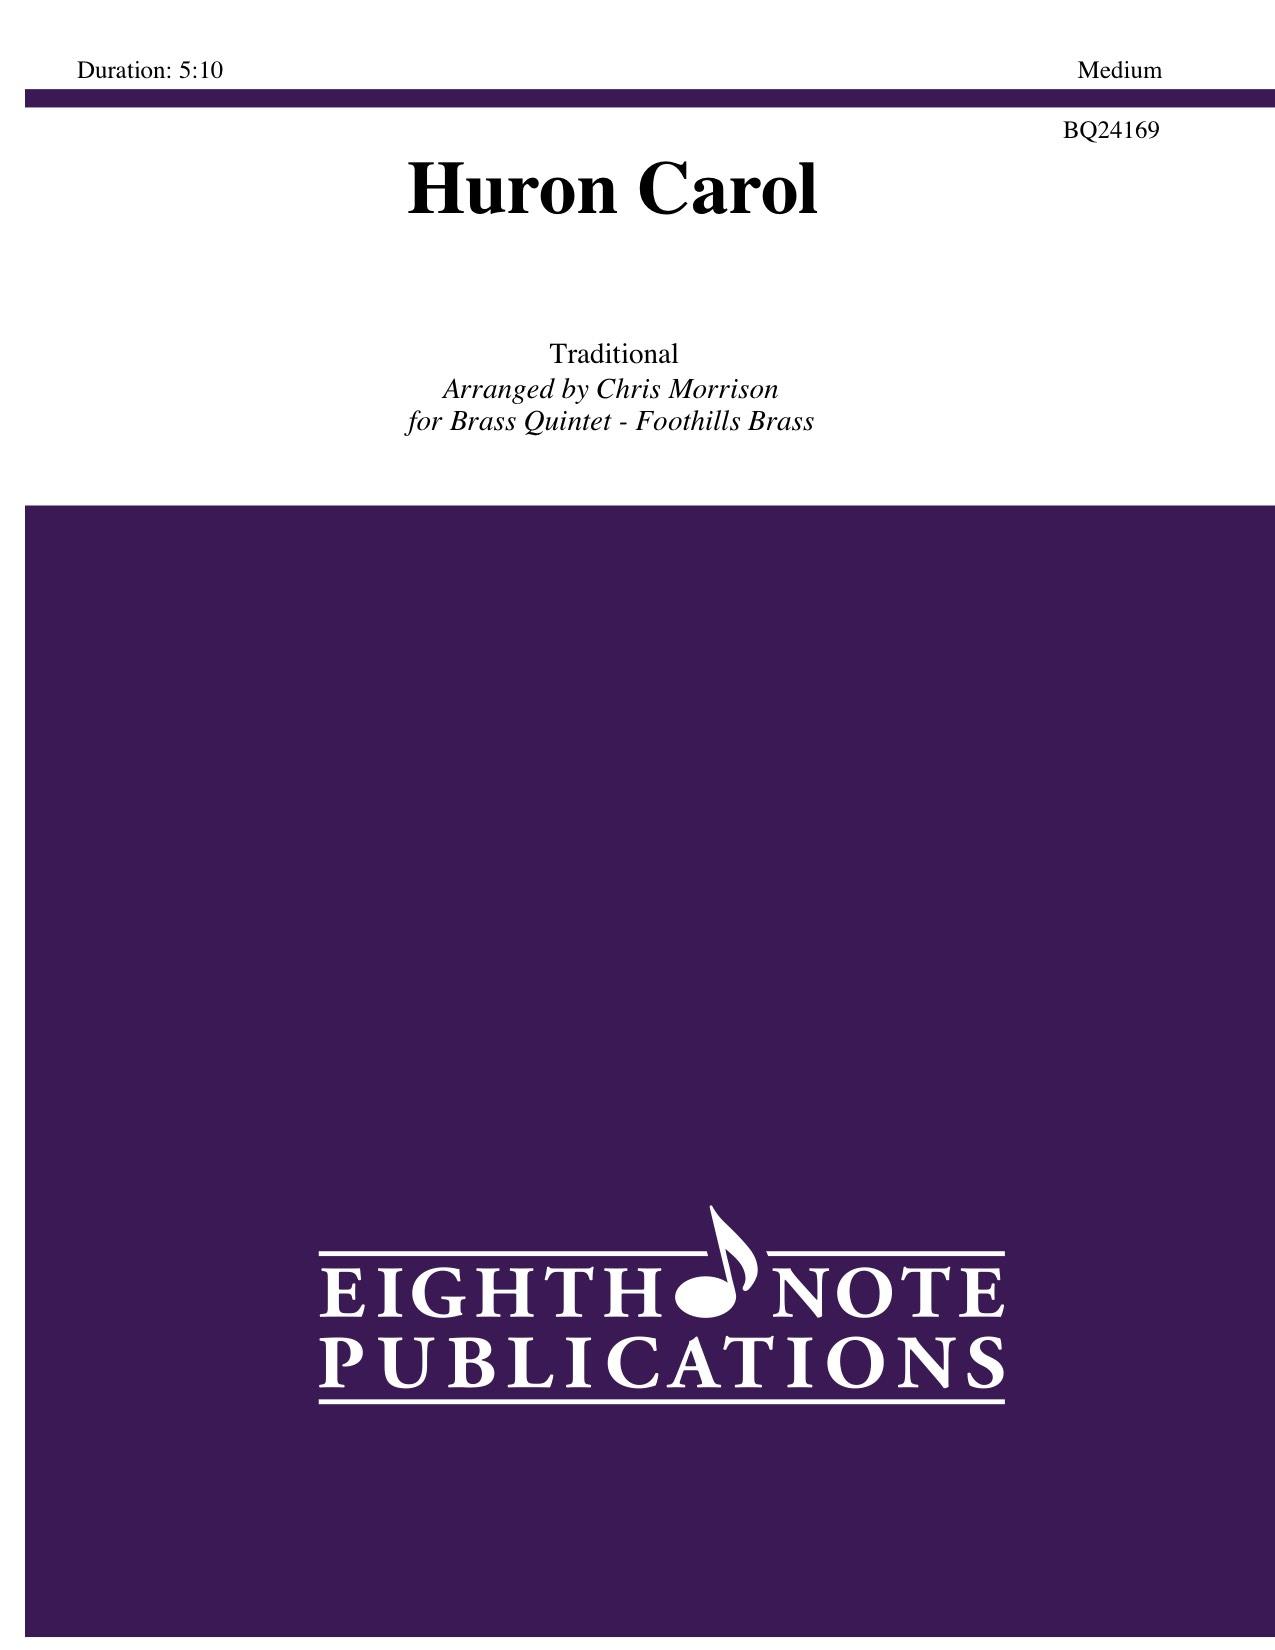 Huron Carol -  Traditional